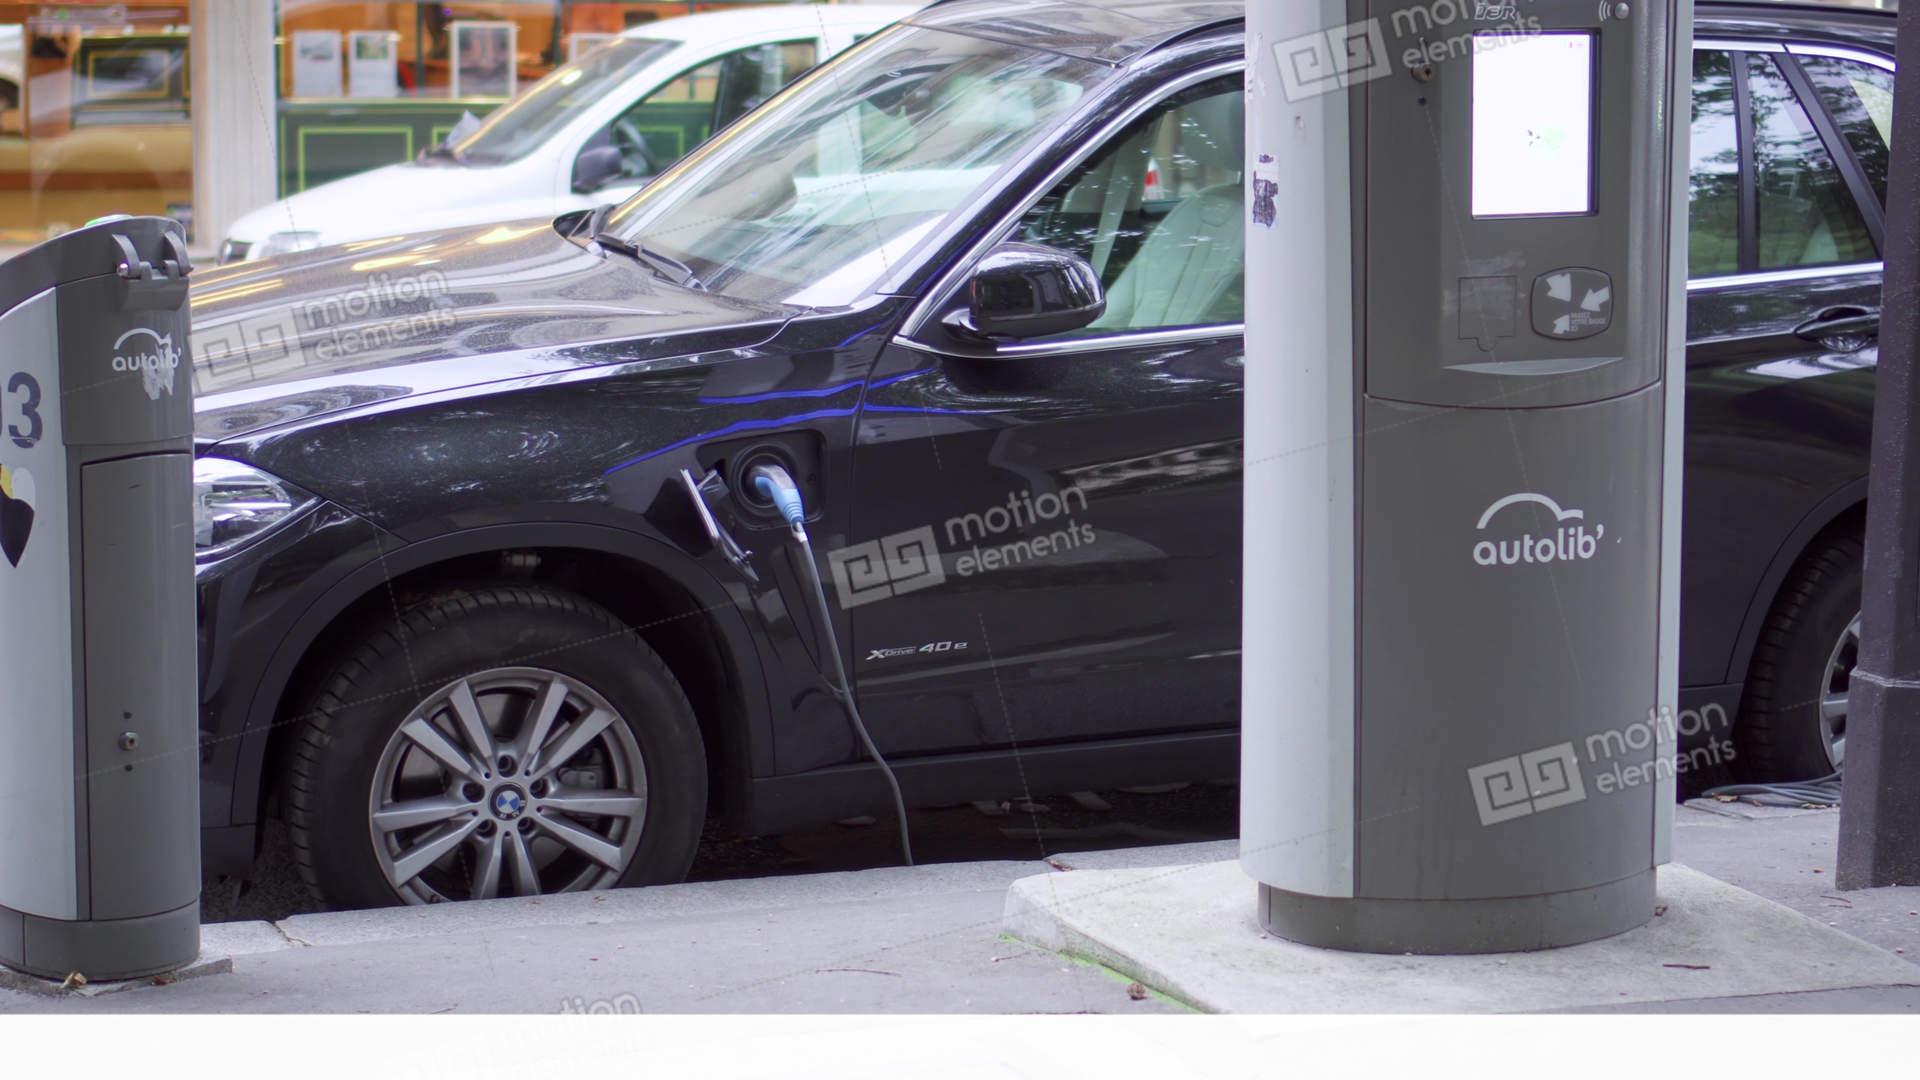 Paris France Circa August 2017 Bmw Electric Car Charging Electro